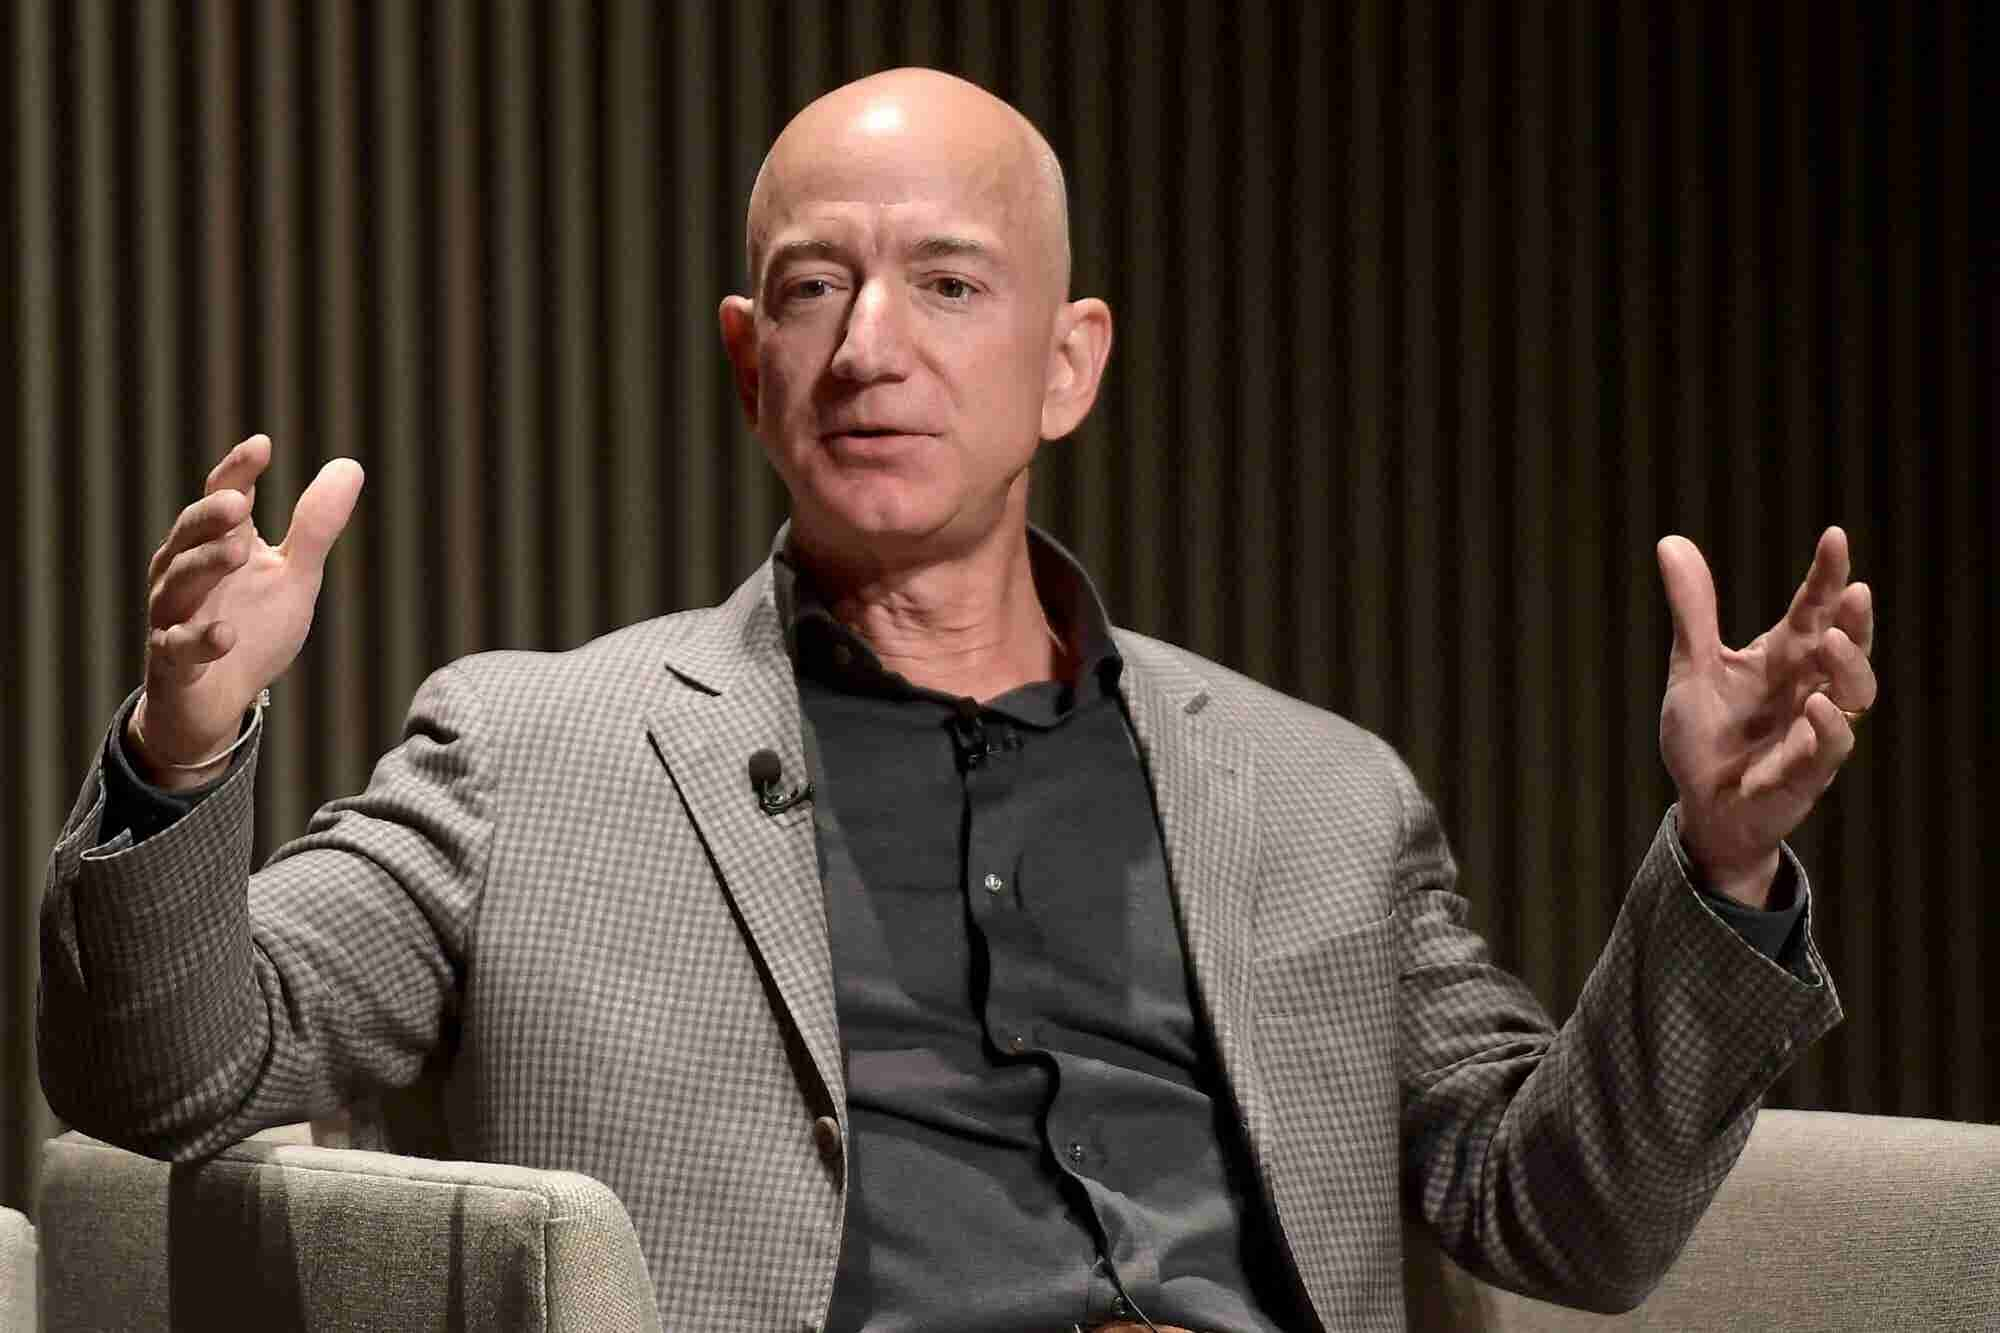 Jeff Bezos: 'I Predict One Day Amazon Will Fail'